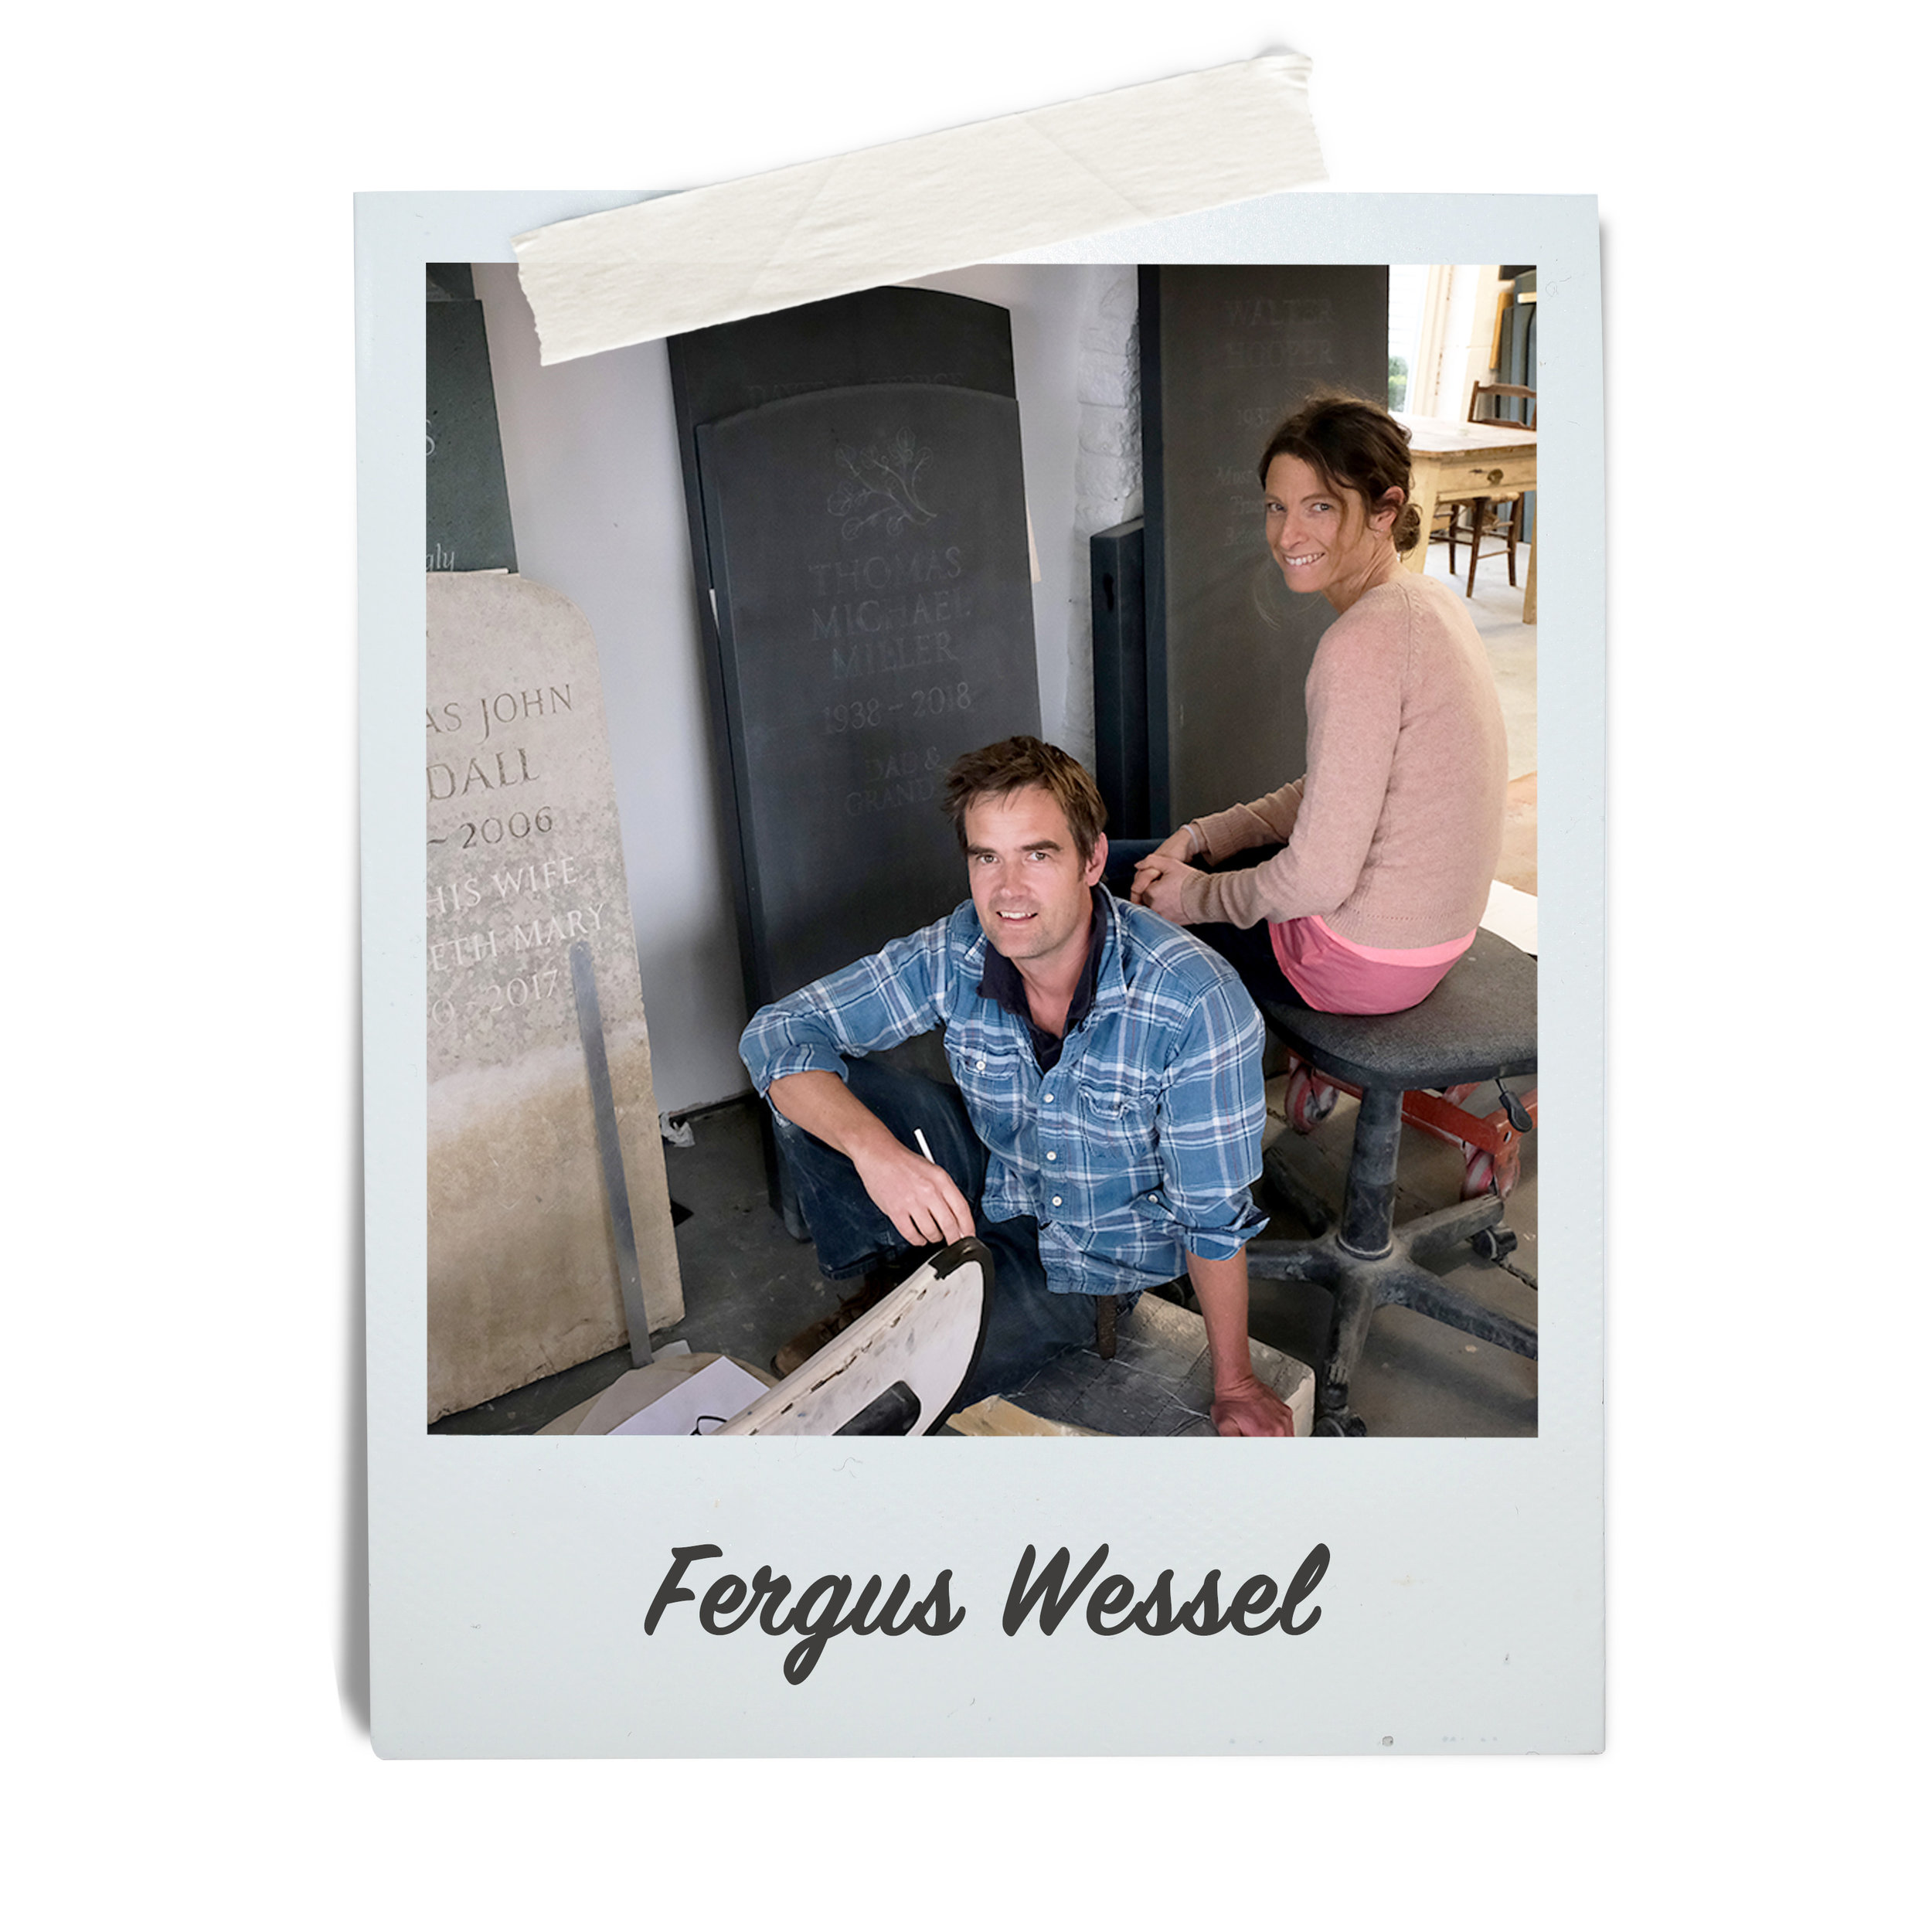 Fergus Wessel